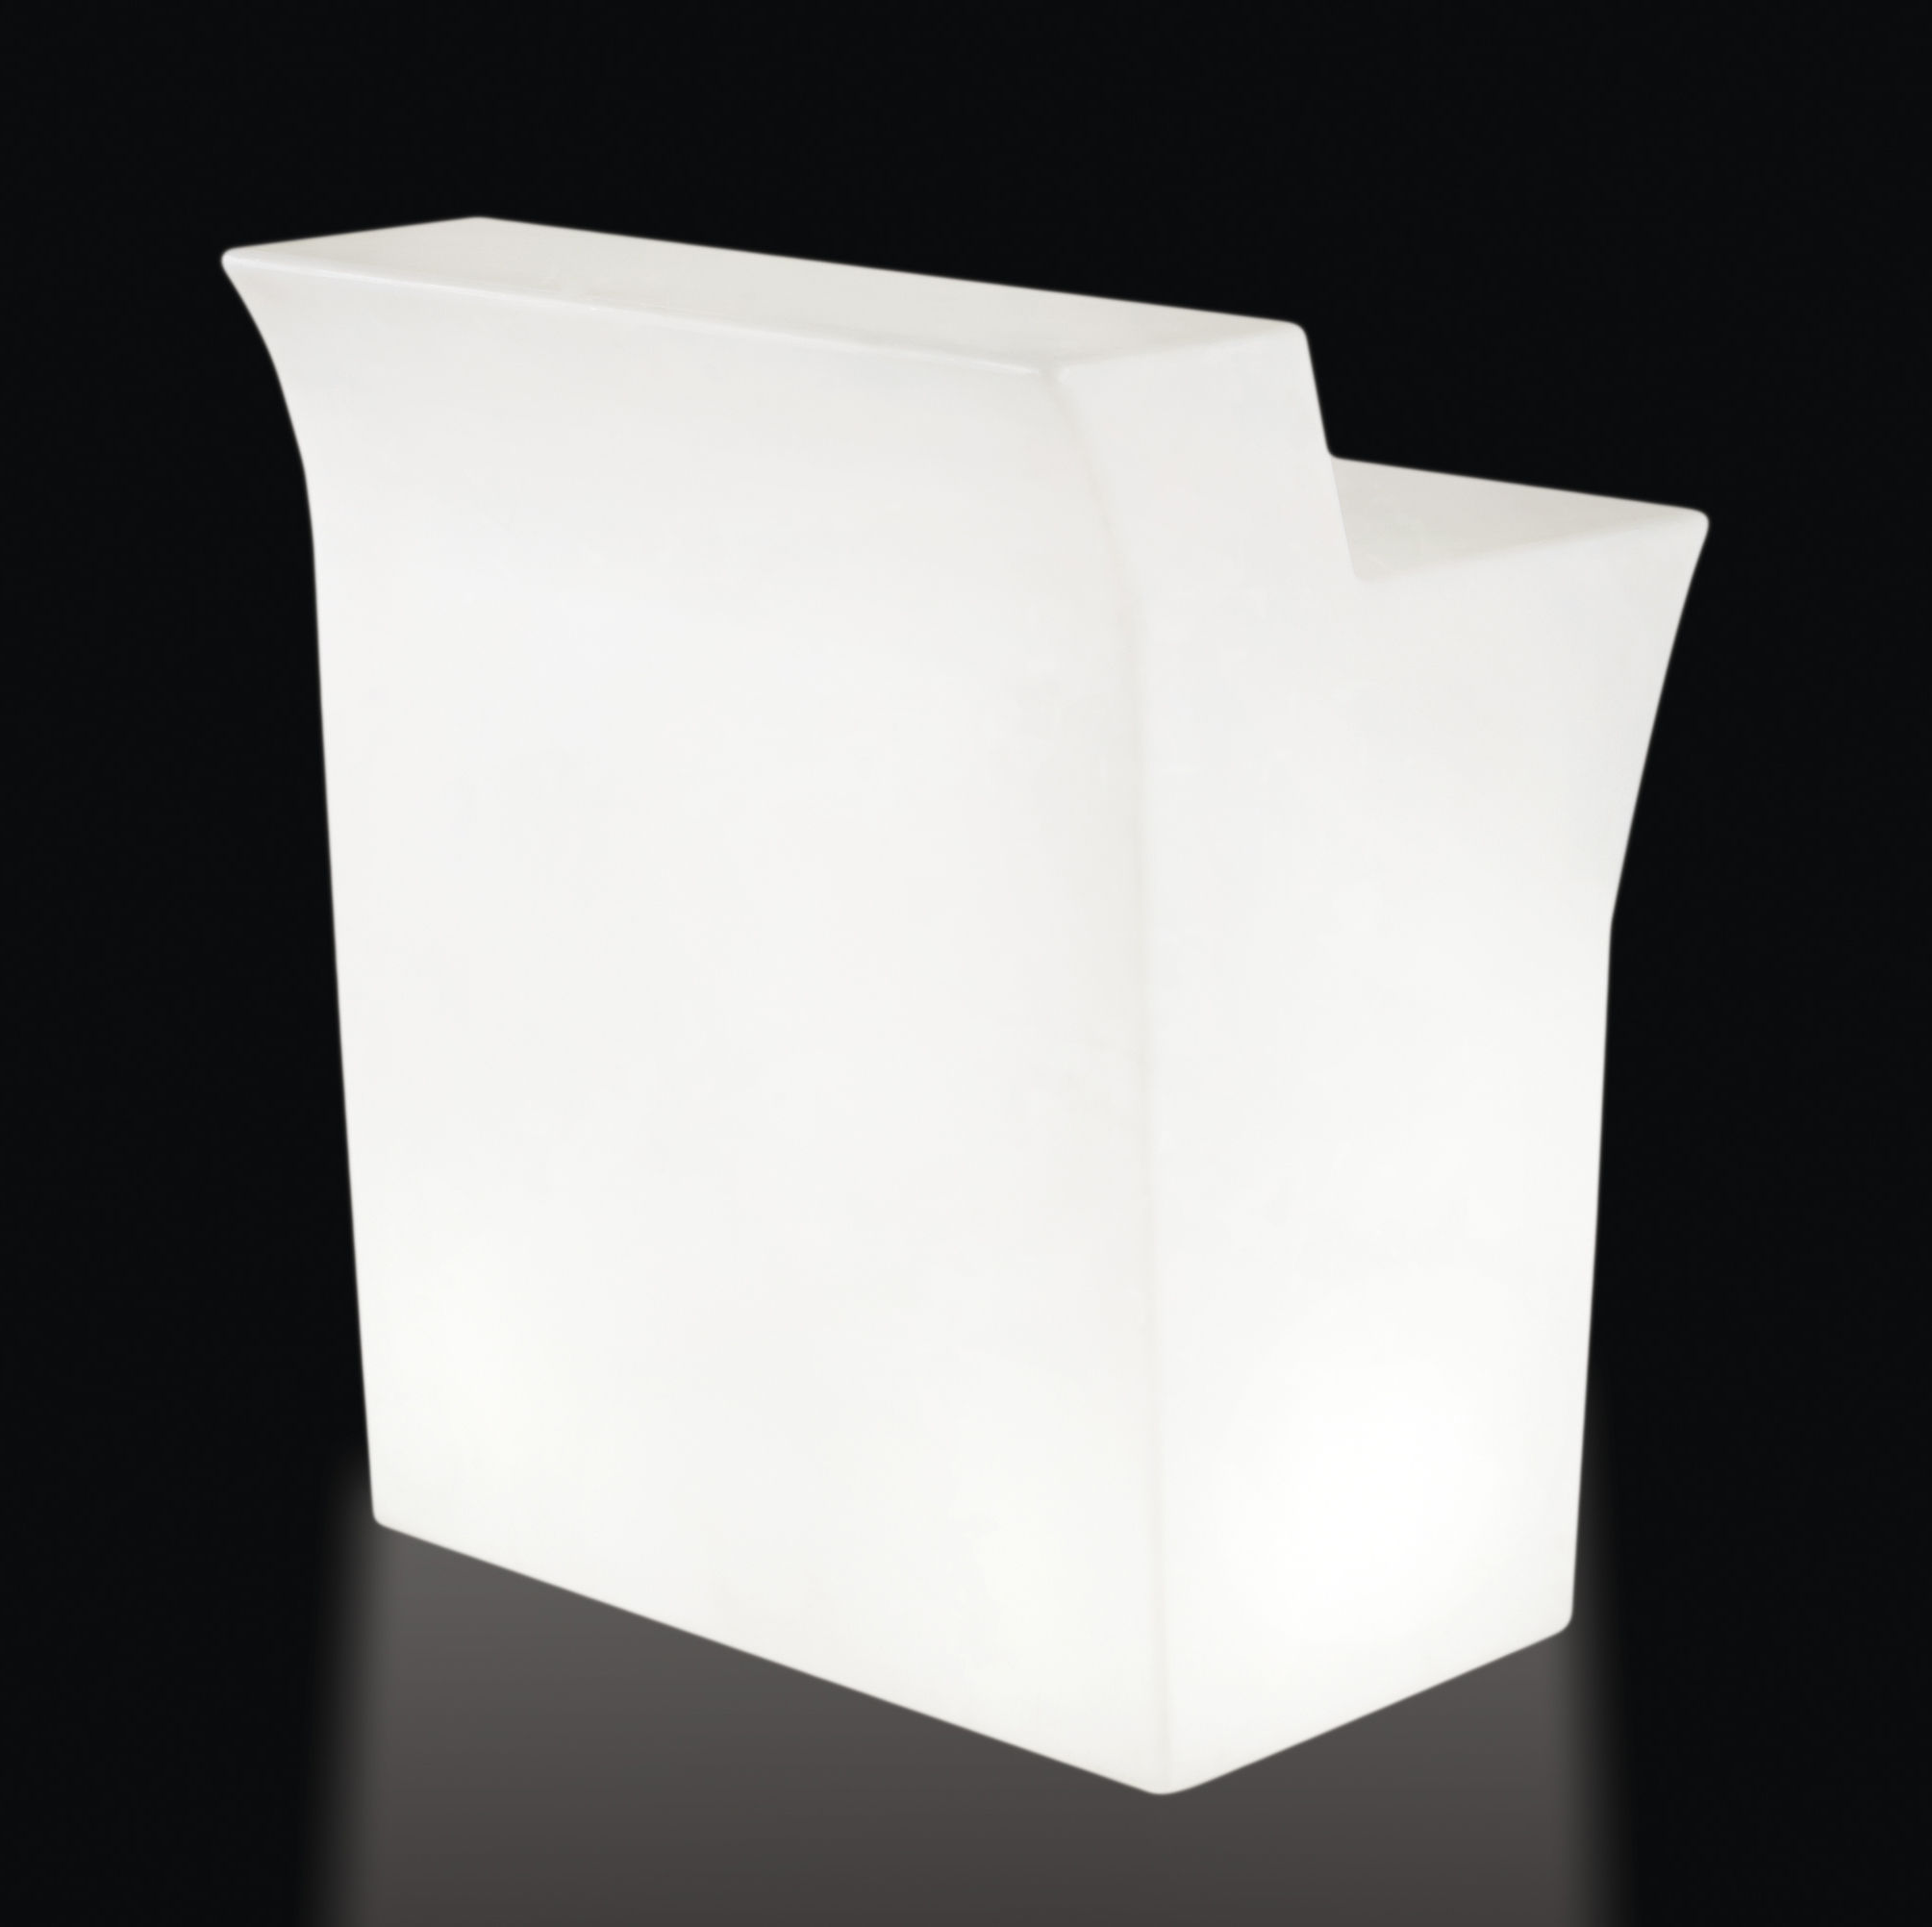 Plafonnier Salle De Bain Jumbo ~ bar lumineux jumbo led rgb l 90 cm sans fil blanc slide made